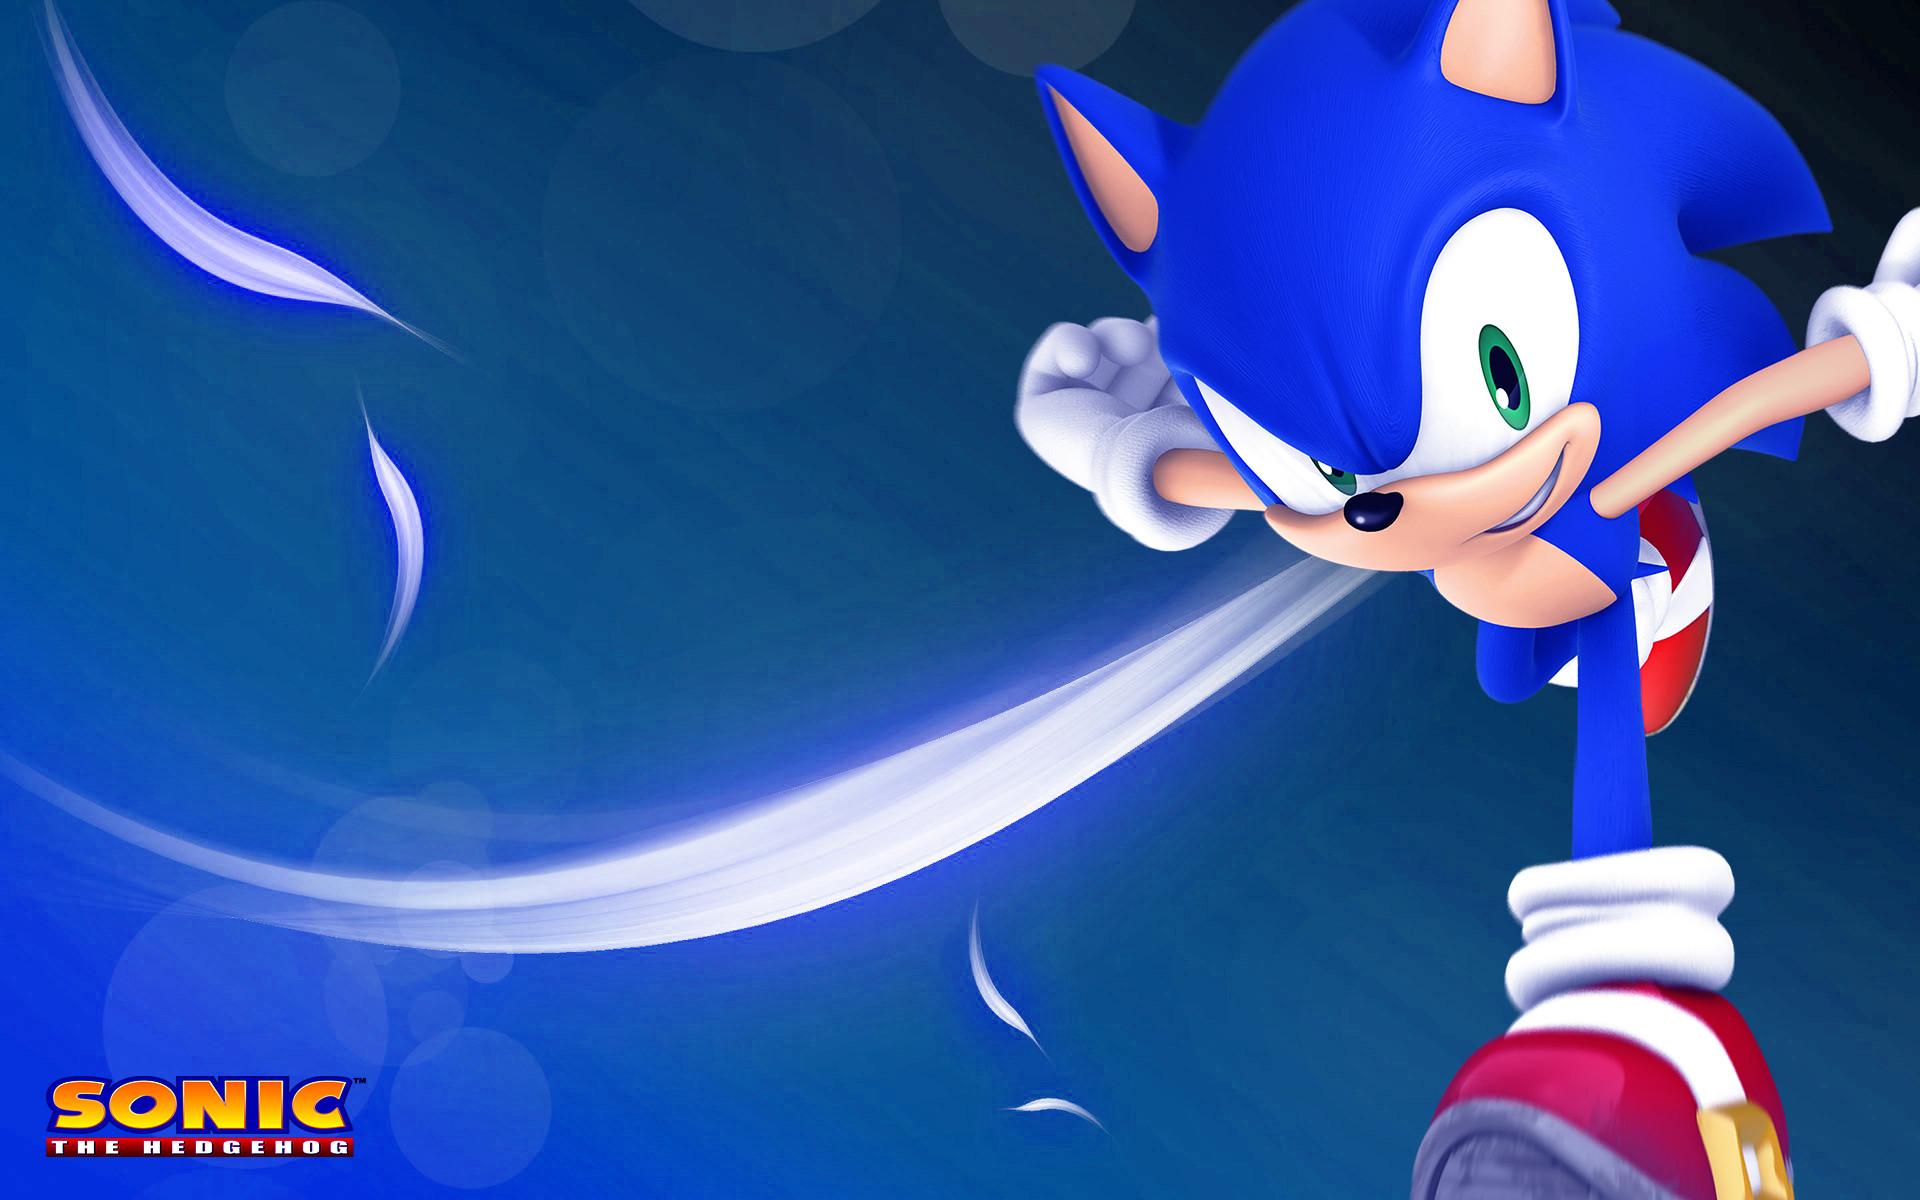 Sonic The Hedgehog Wallpaper 2018 Wallpapertag